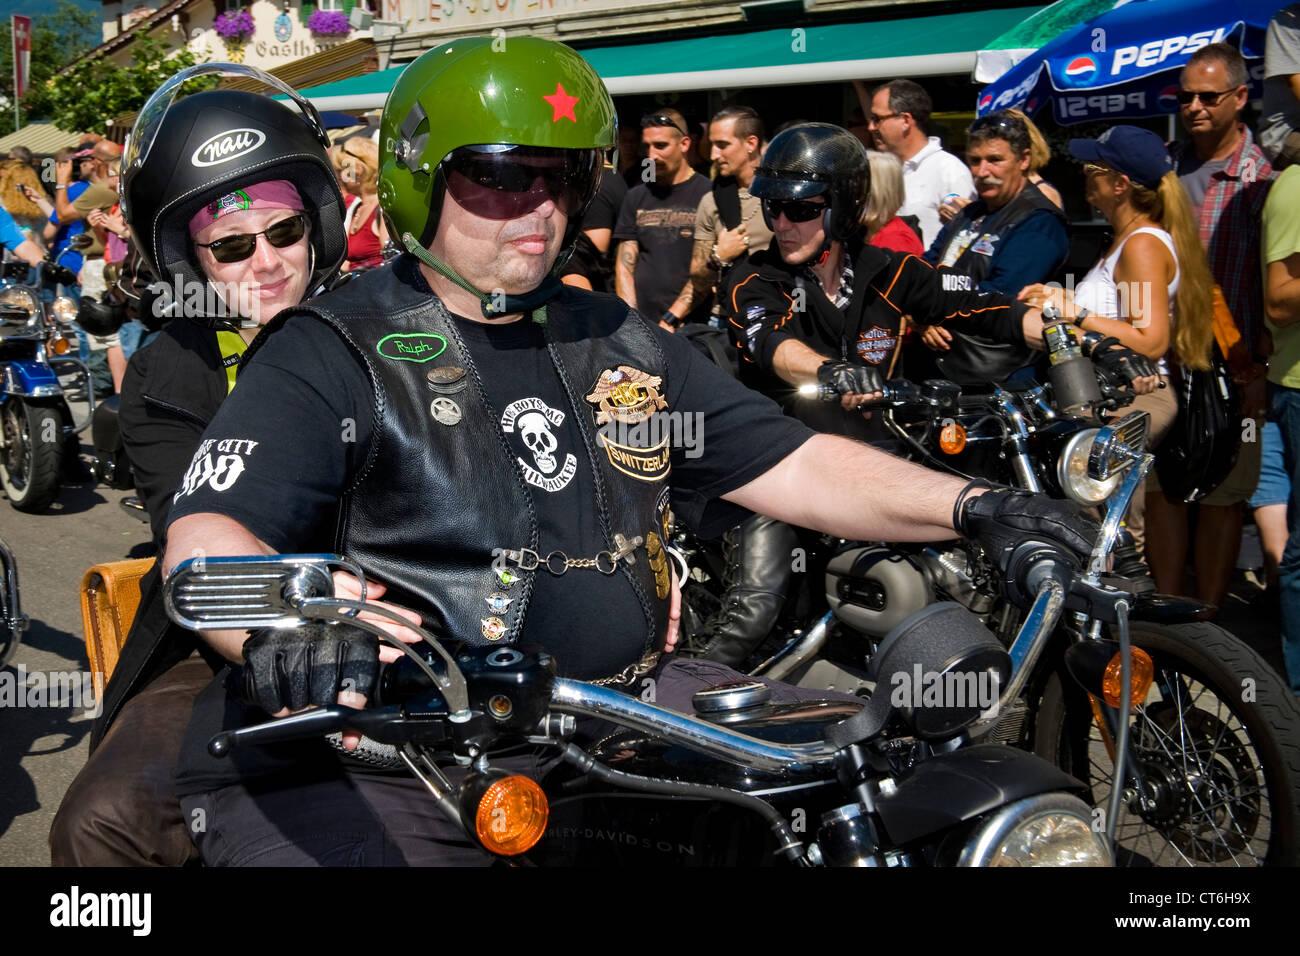 Switzerland Brunnen Harley Davidson Festival Stock Photos ...